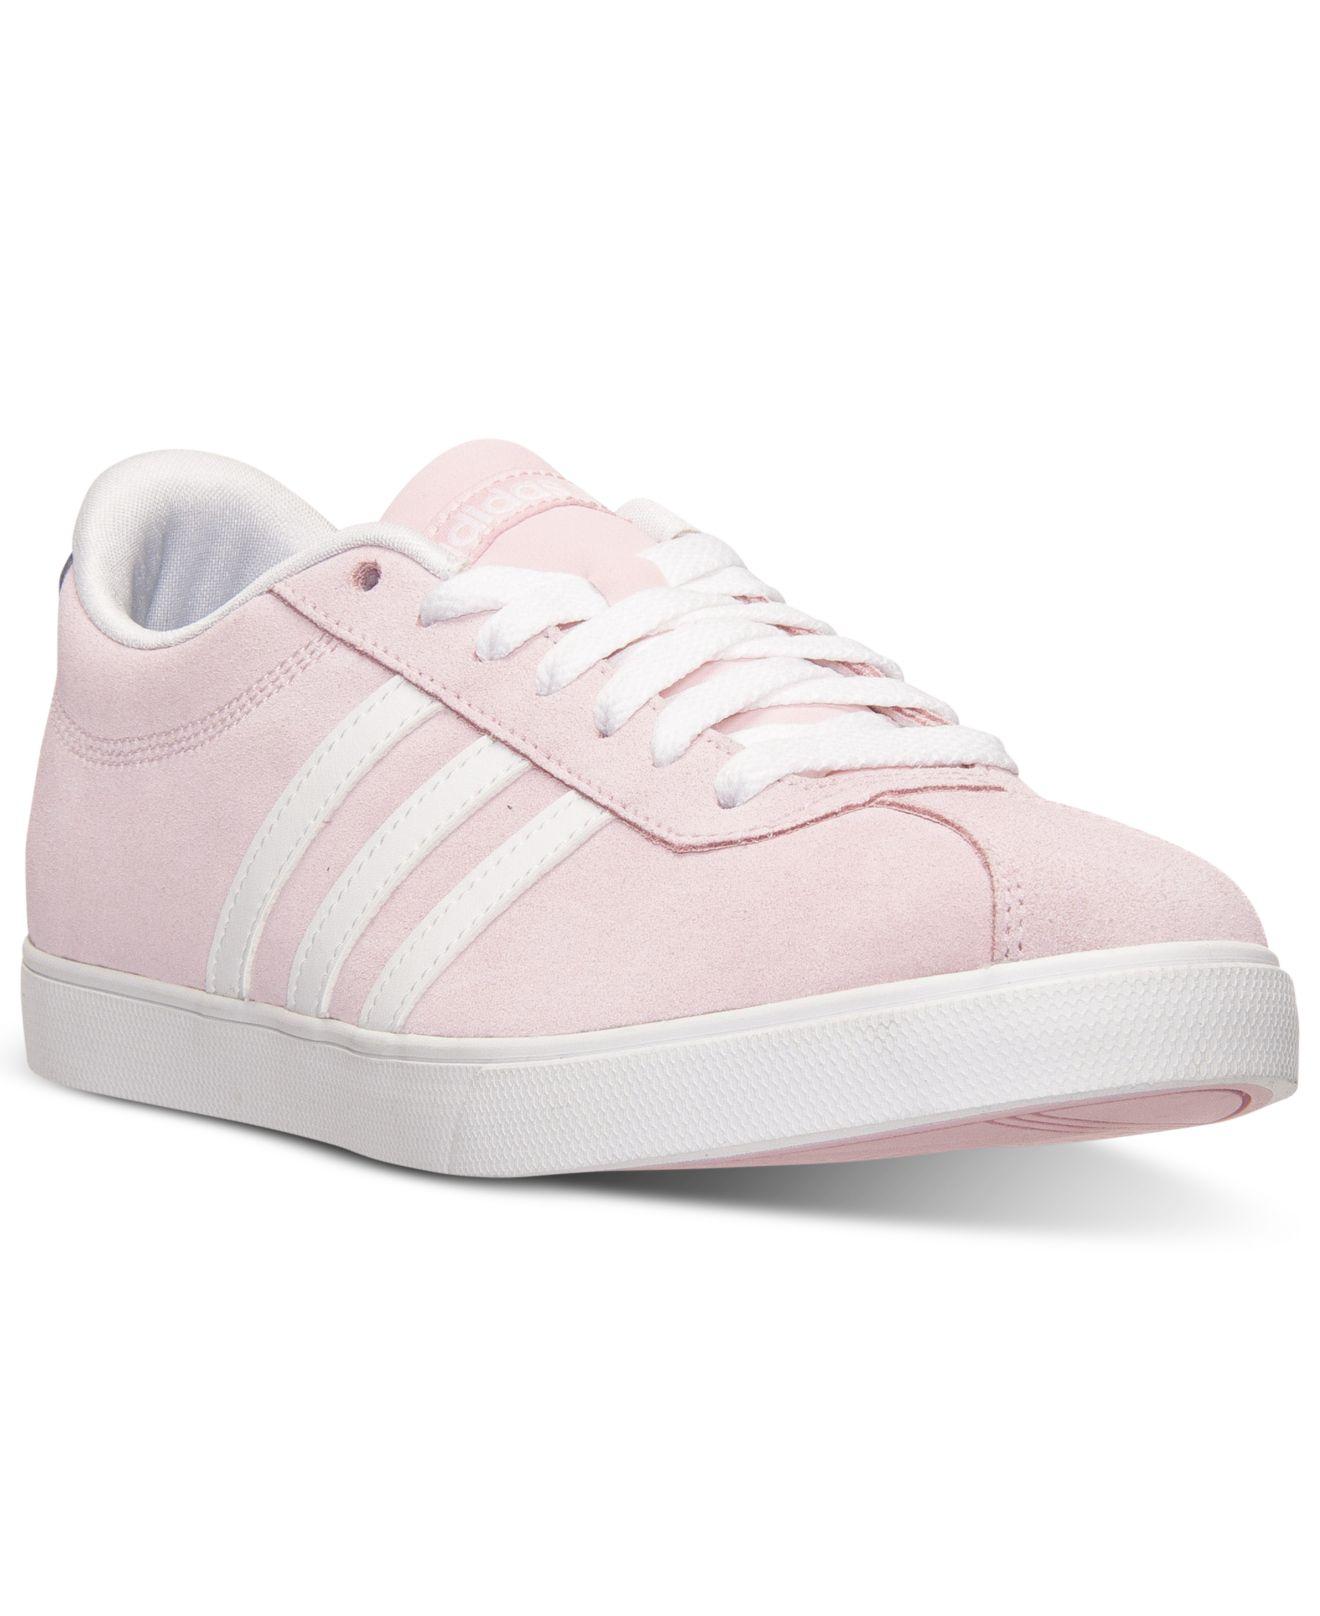 Adidas Sneakers Sneakers para damas Adidas 2897 | a938ab4 - antibiotikaamning.website